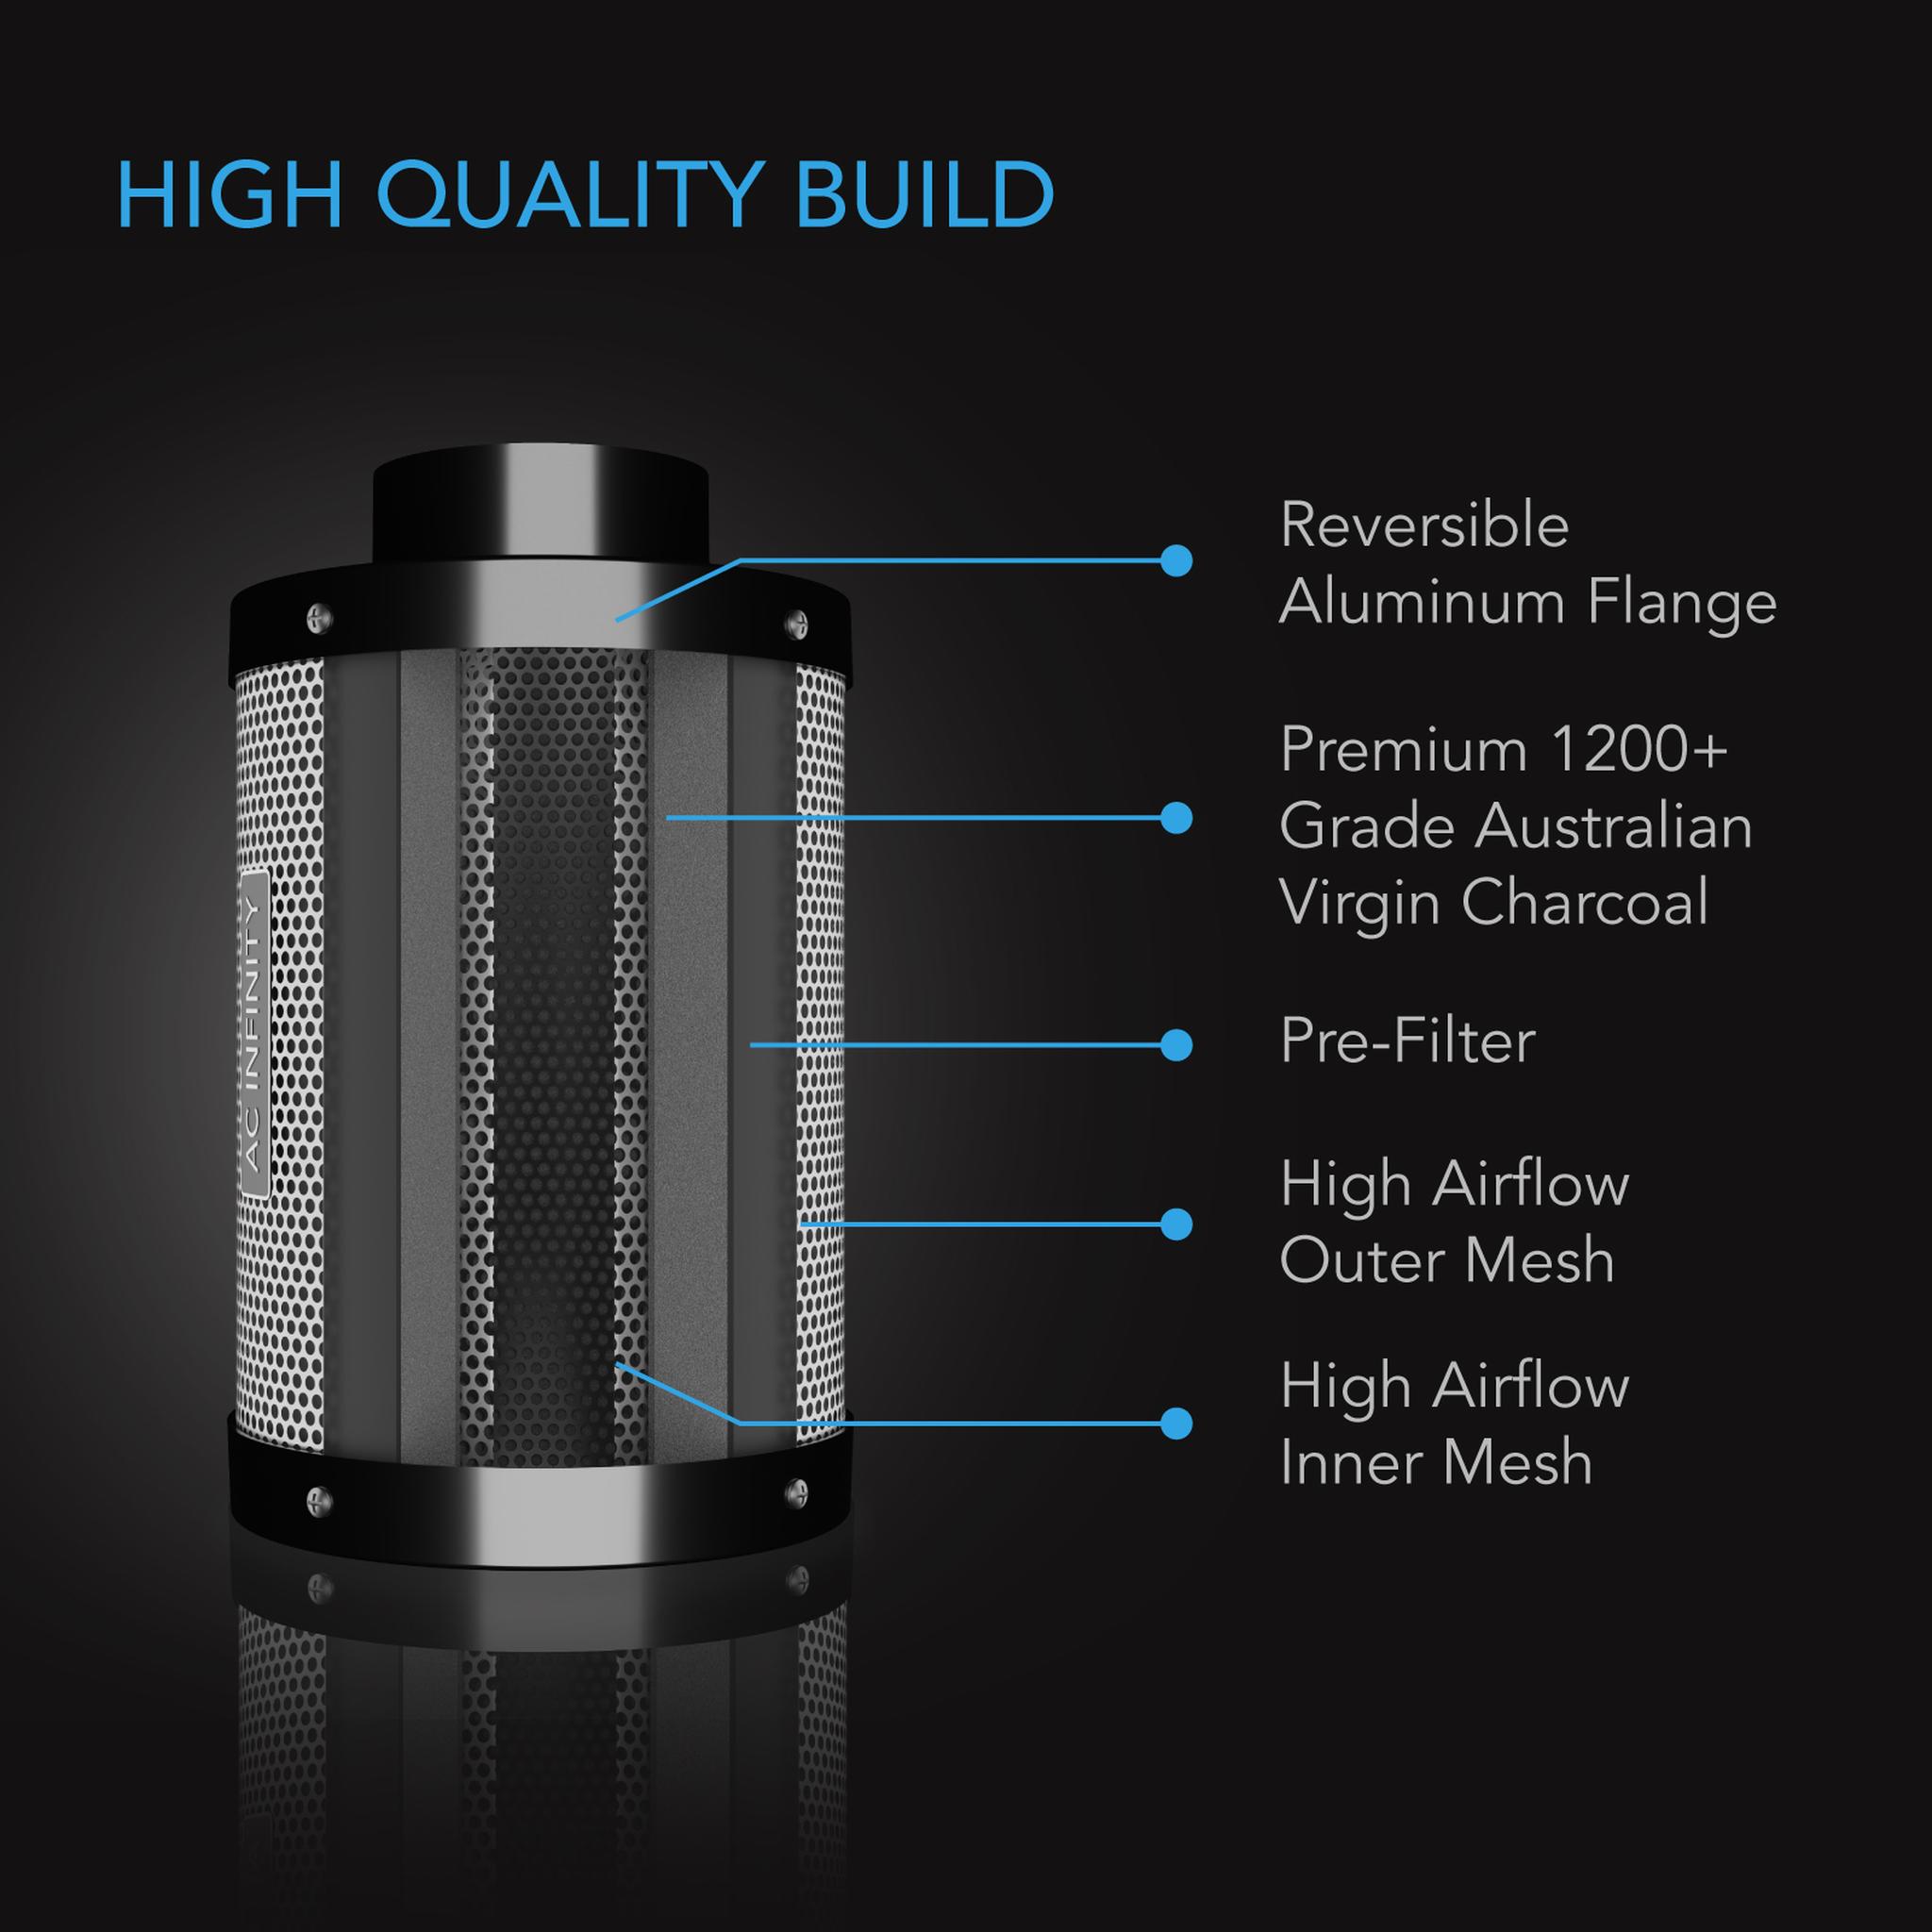 High Quality Build